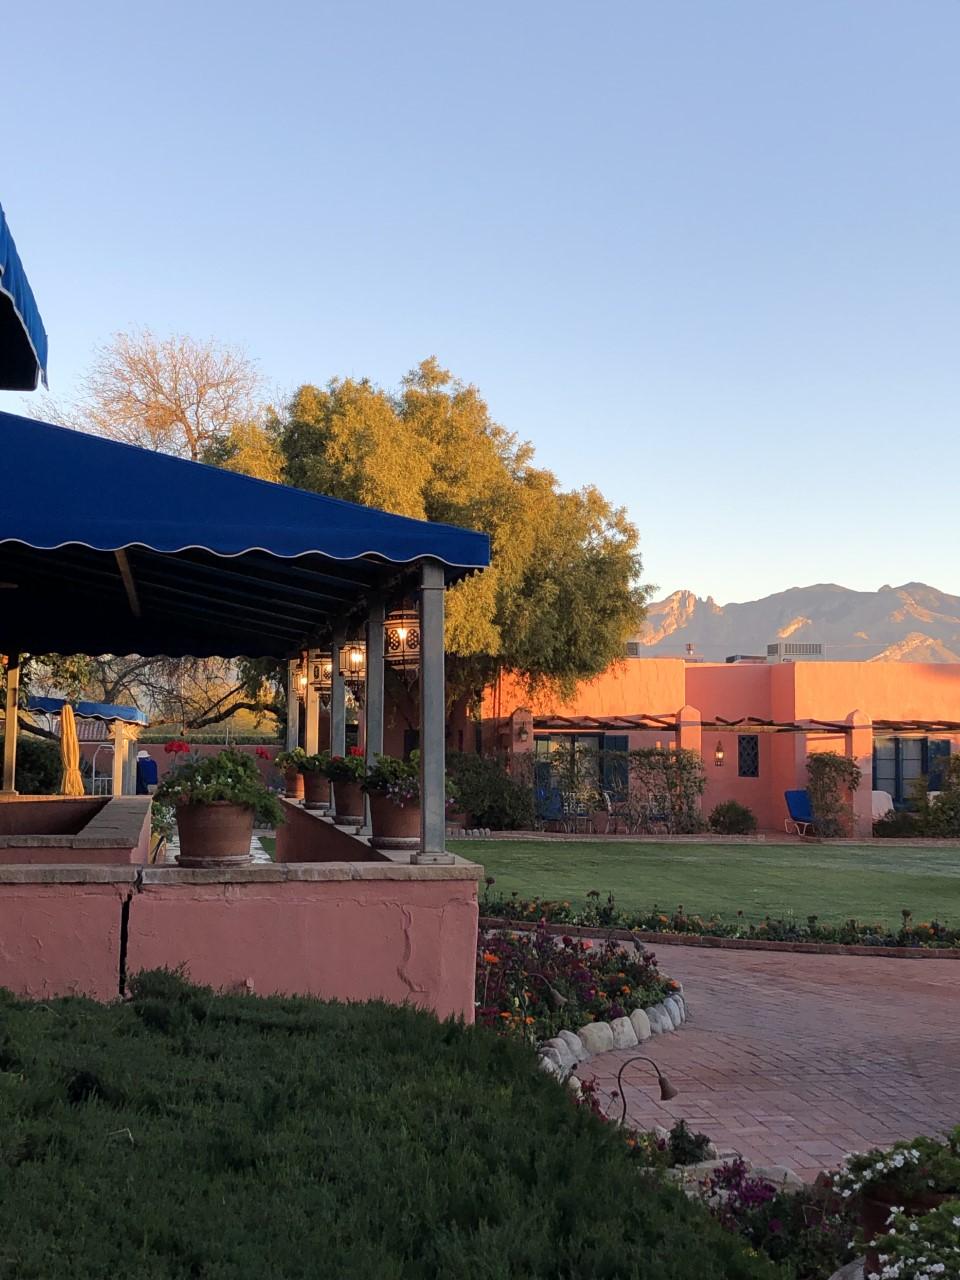 Outside the Arizona Inn